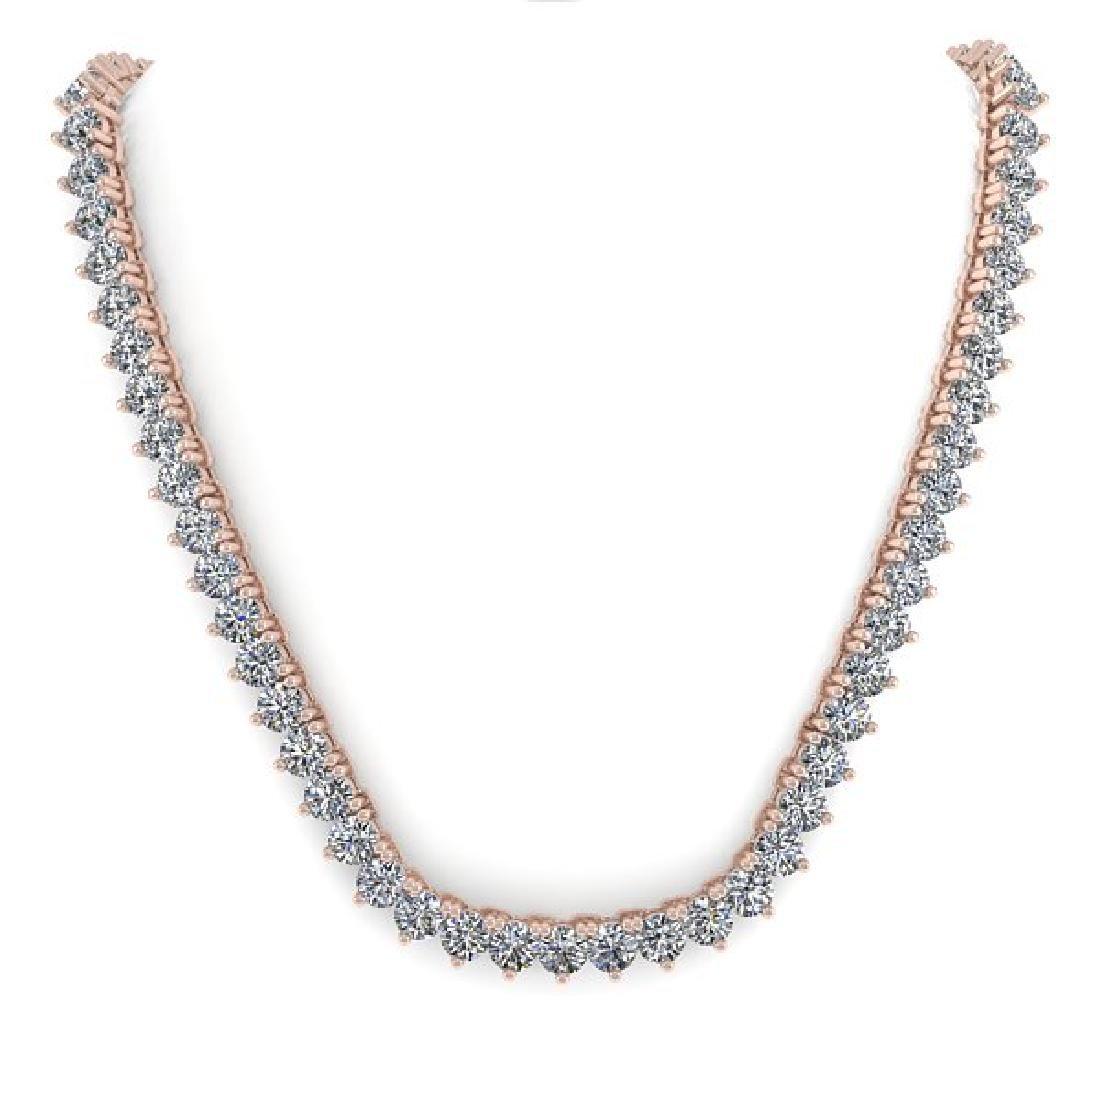 20 CTW Solitaire VS/SI Diamond Necklace 14K Rose Gold - 3